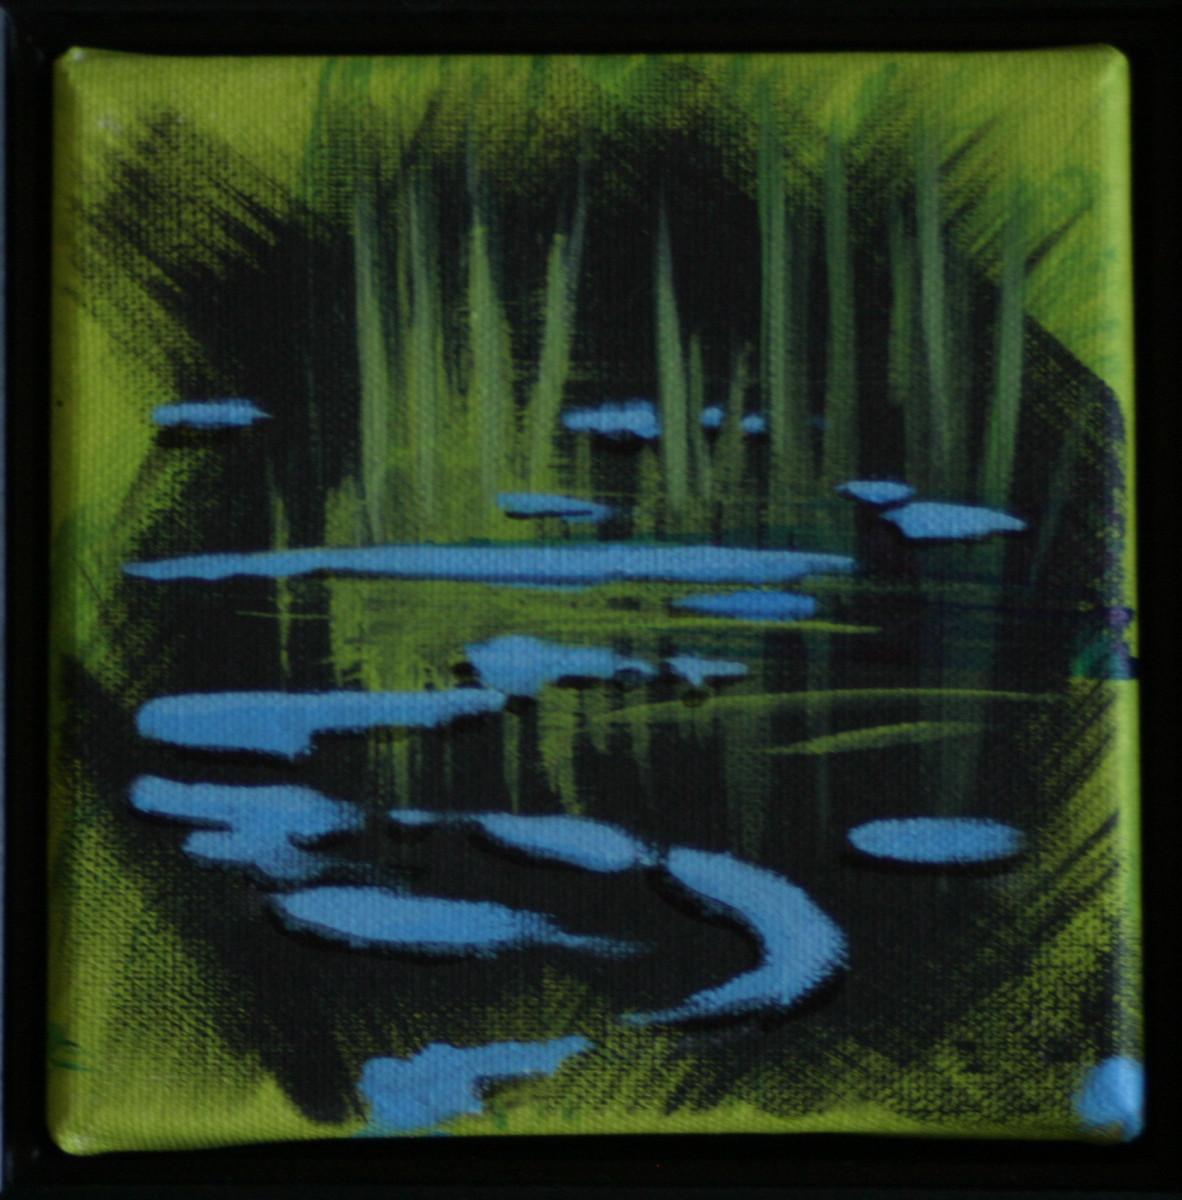 Black Water 18 by Karen Phillips~Curran